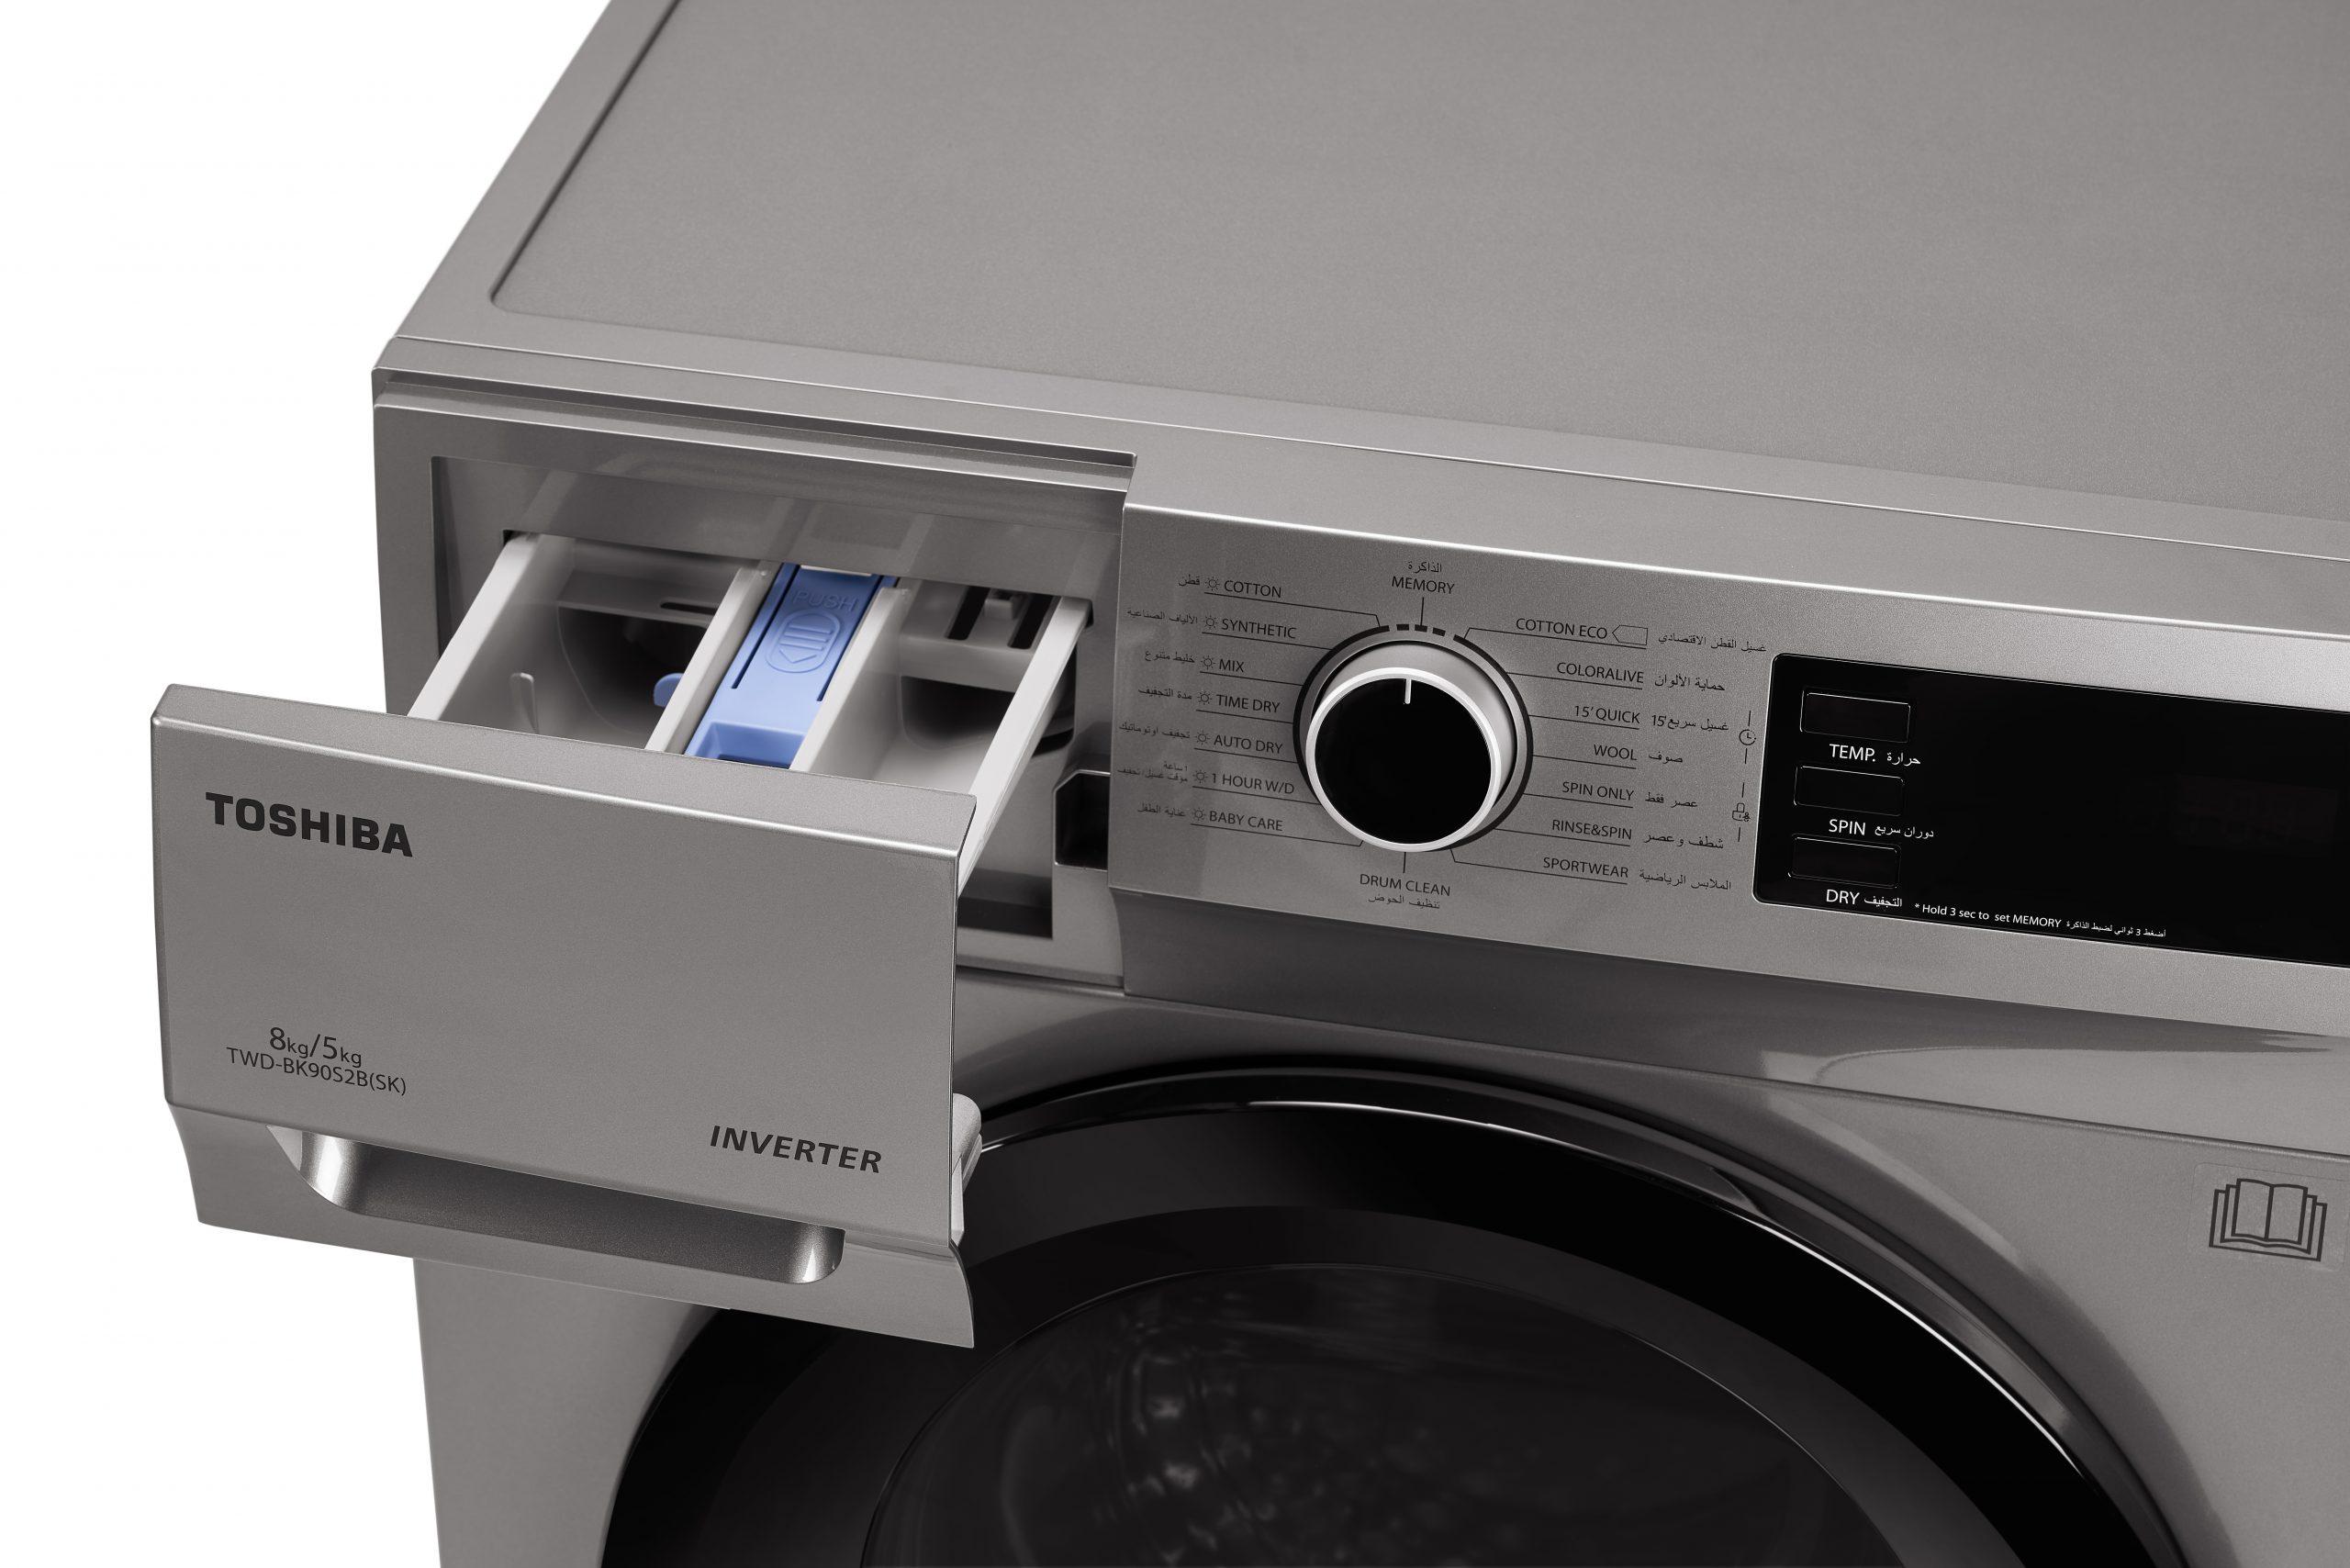 Paltaryuyan Toshiba TWD-BK90S2GE(SK)  - 4